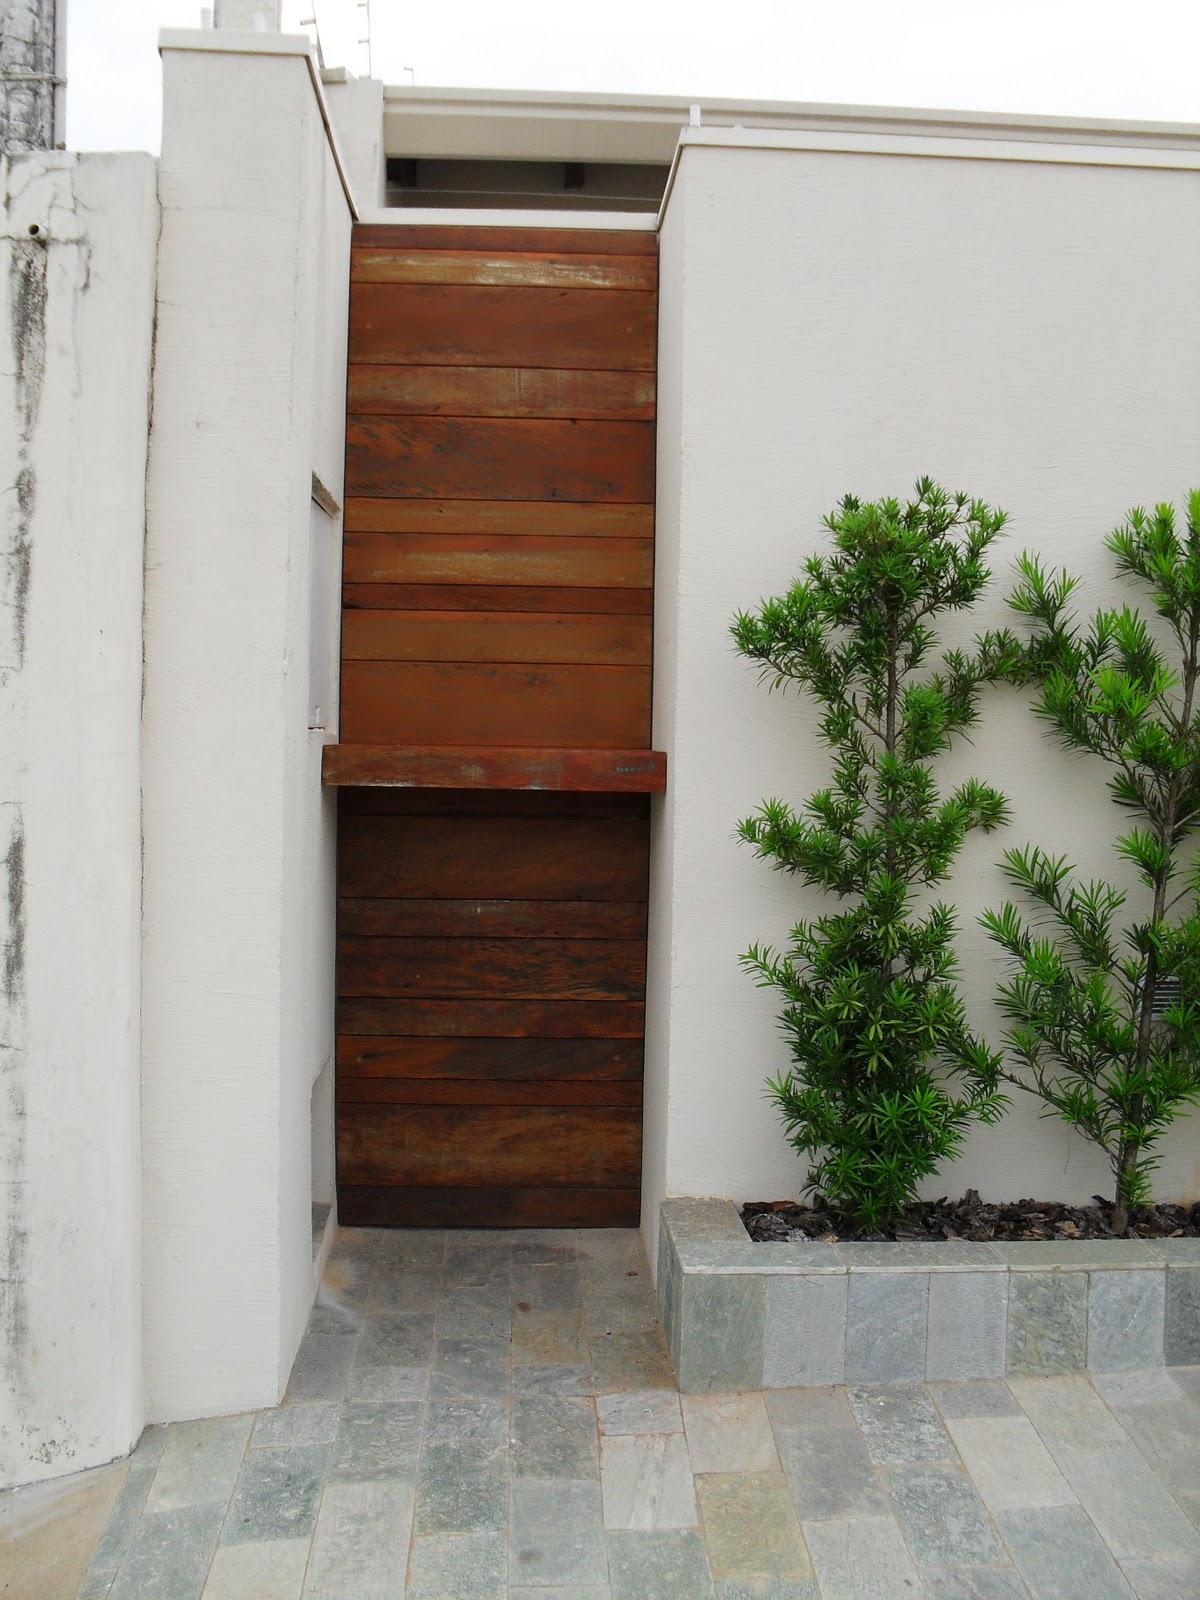 Fotos de casas decoradas por dentro 1jpg ajilbab com - Casas decoradas por dentro ...